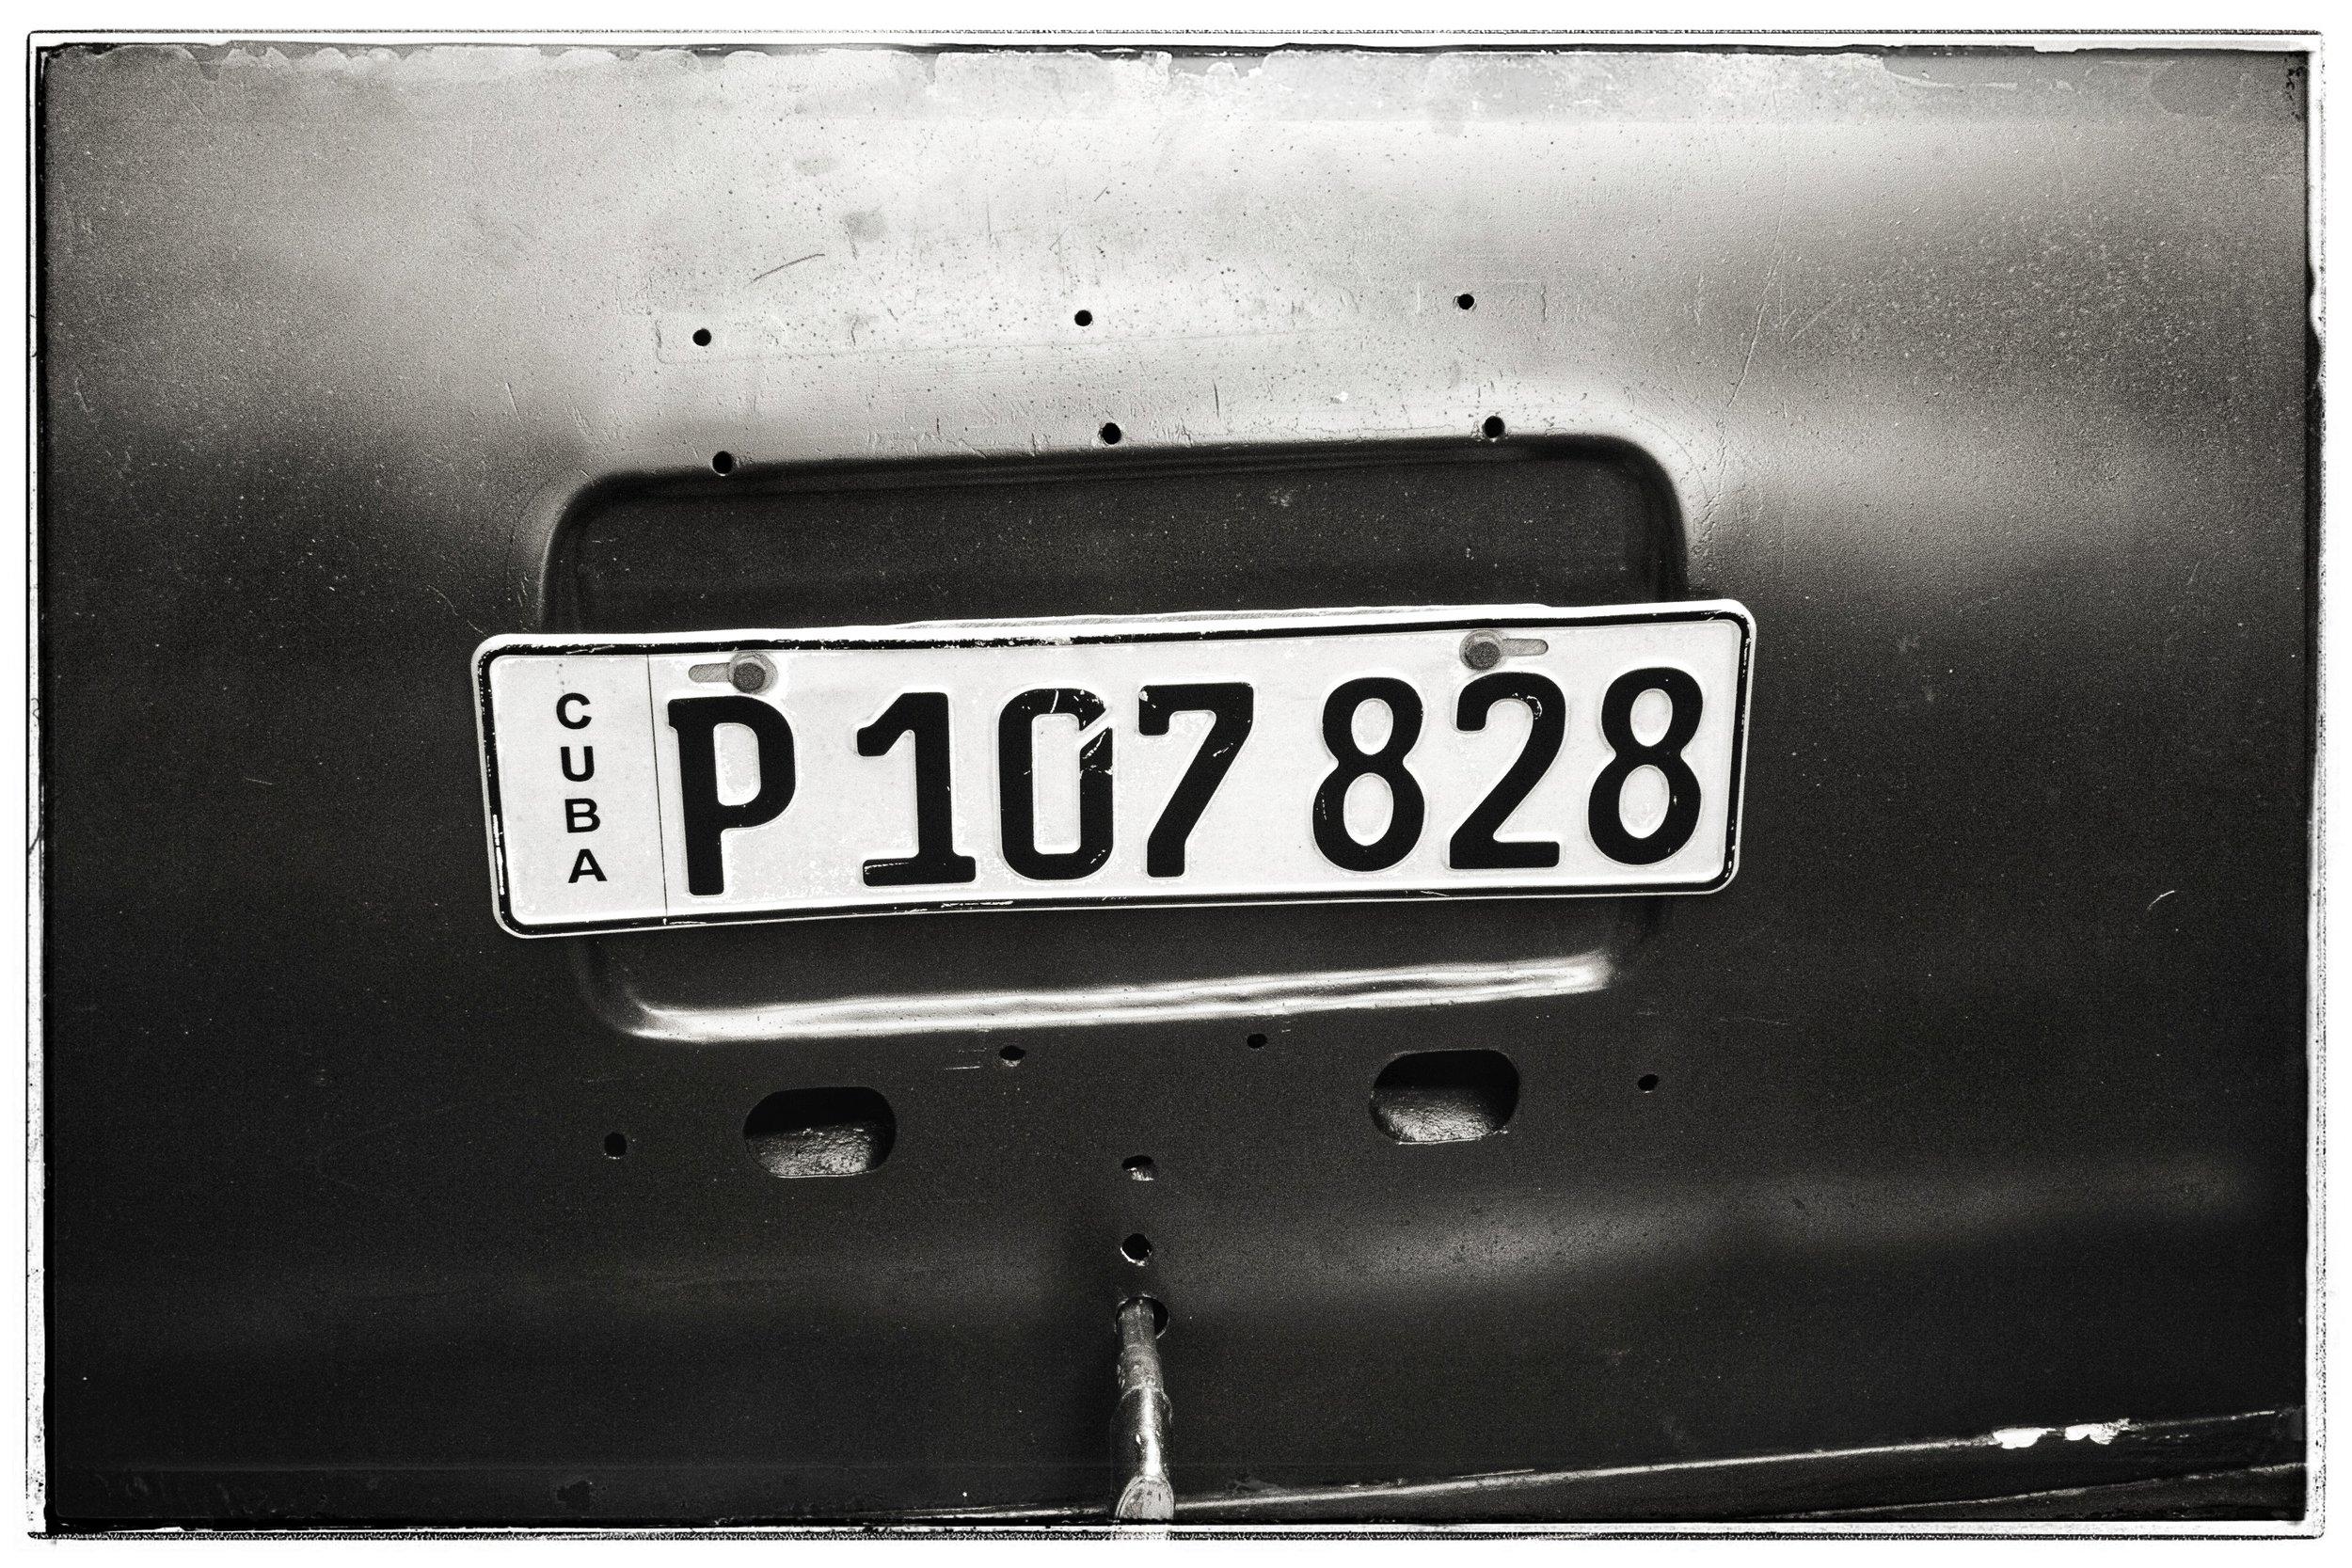 Simple license plates.